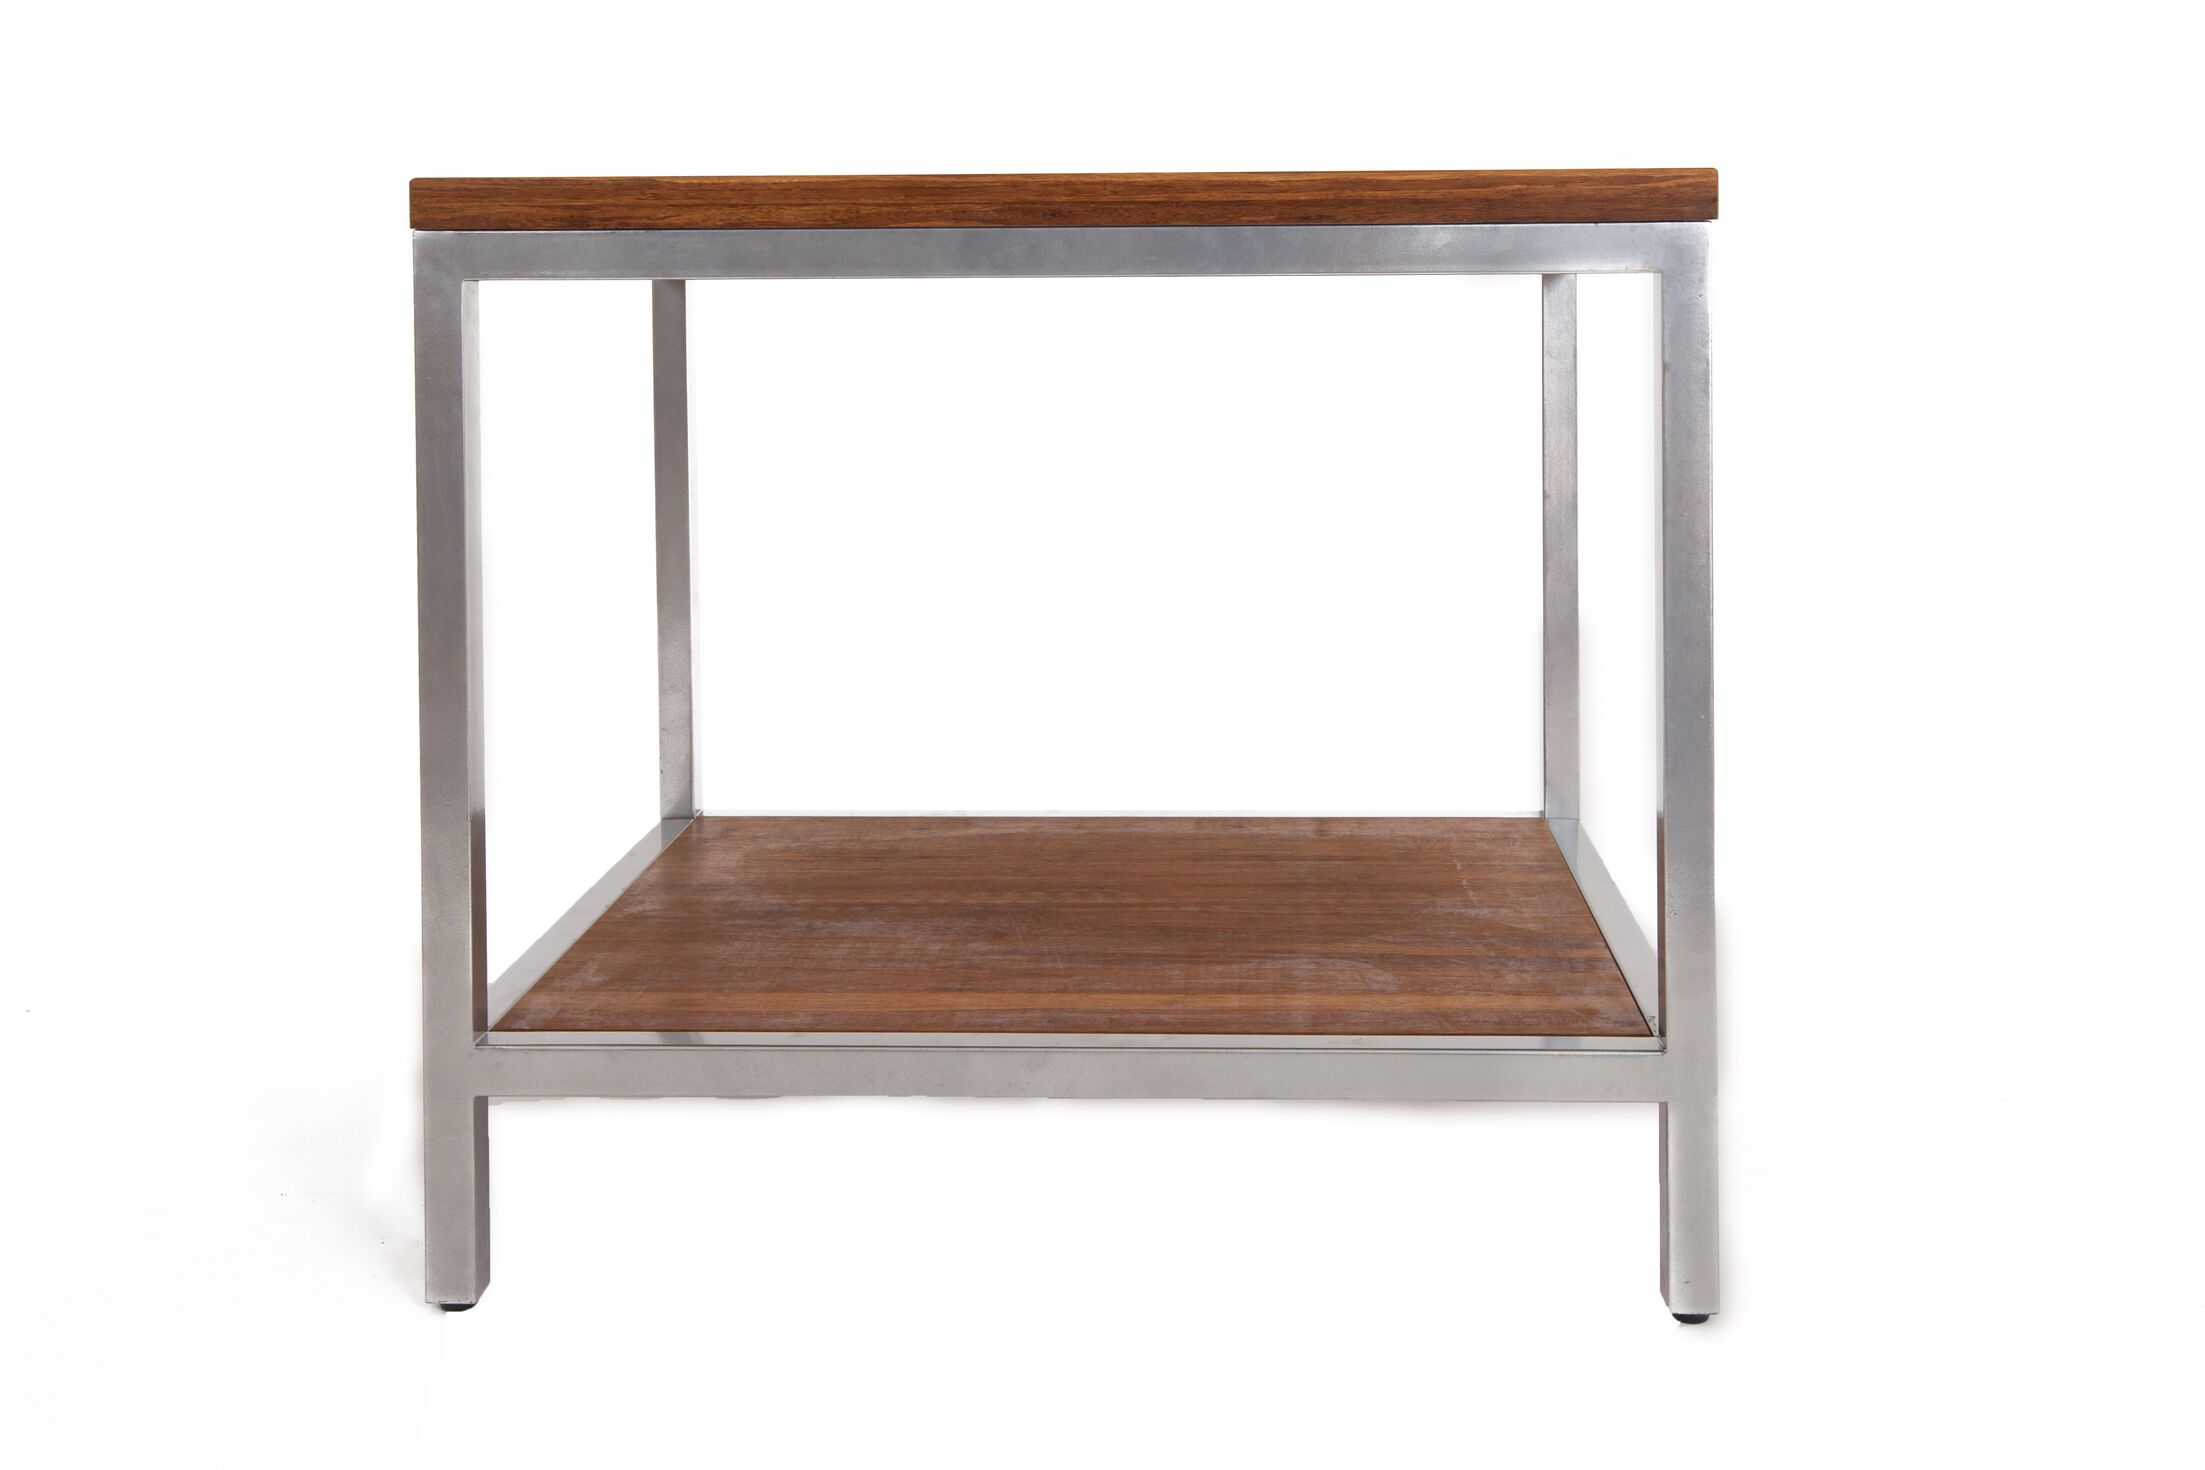 Betances Steel Framed Bamboo Side Table Color: Koa